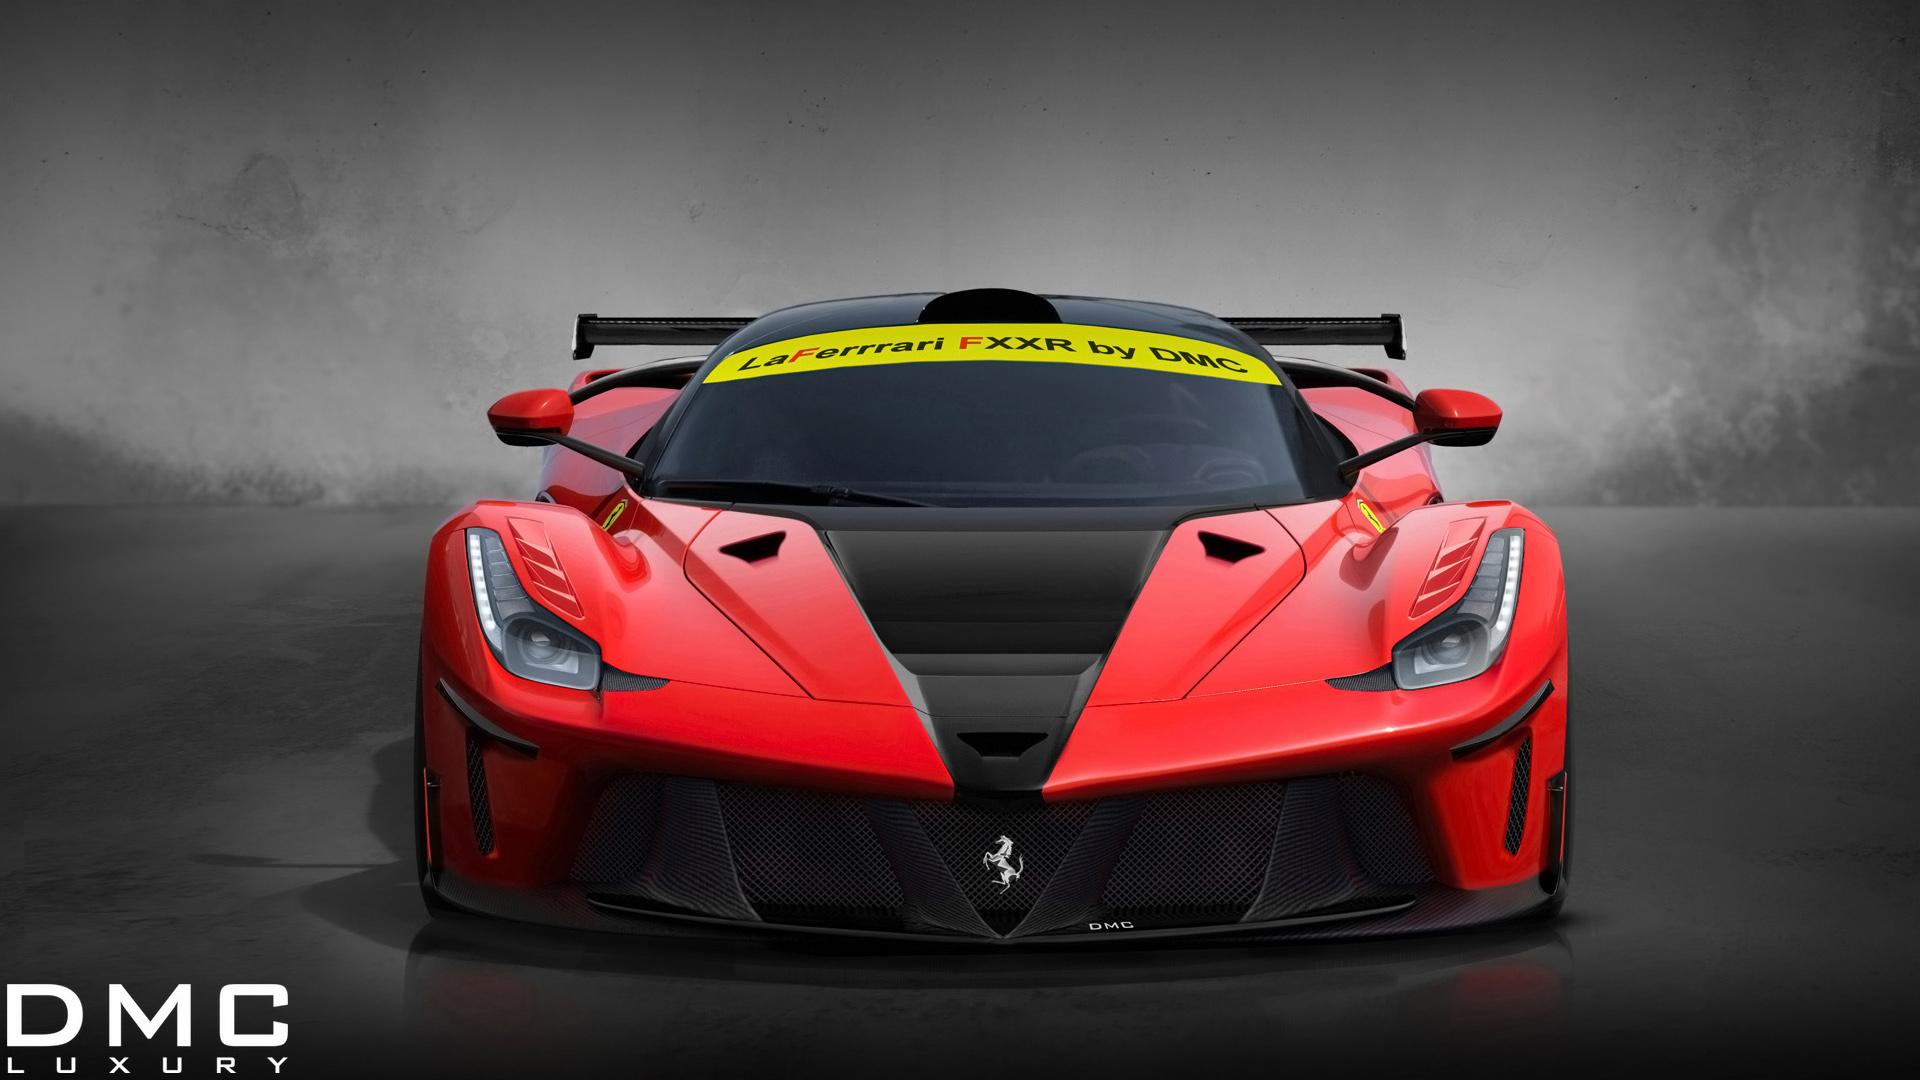 42 HD Ferrari Wallpapers For Free Download